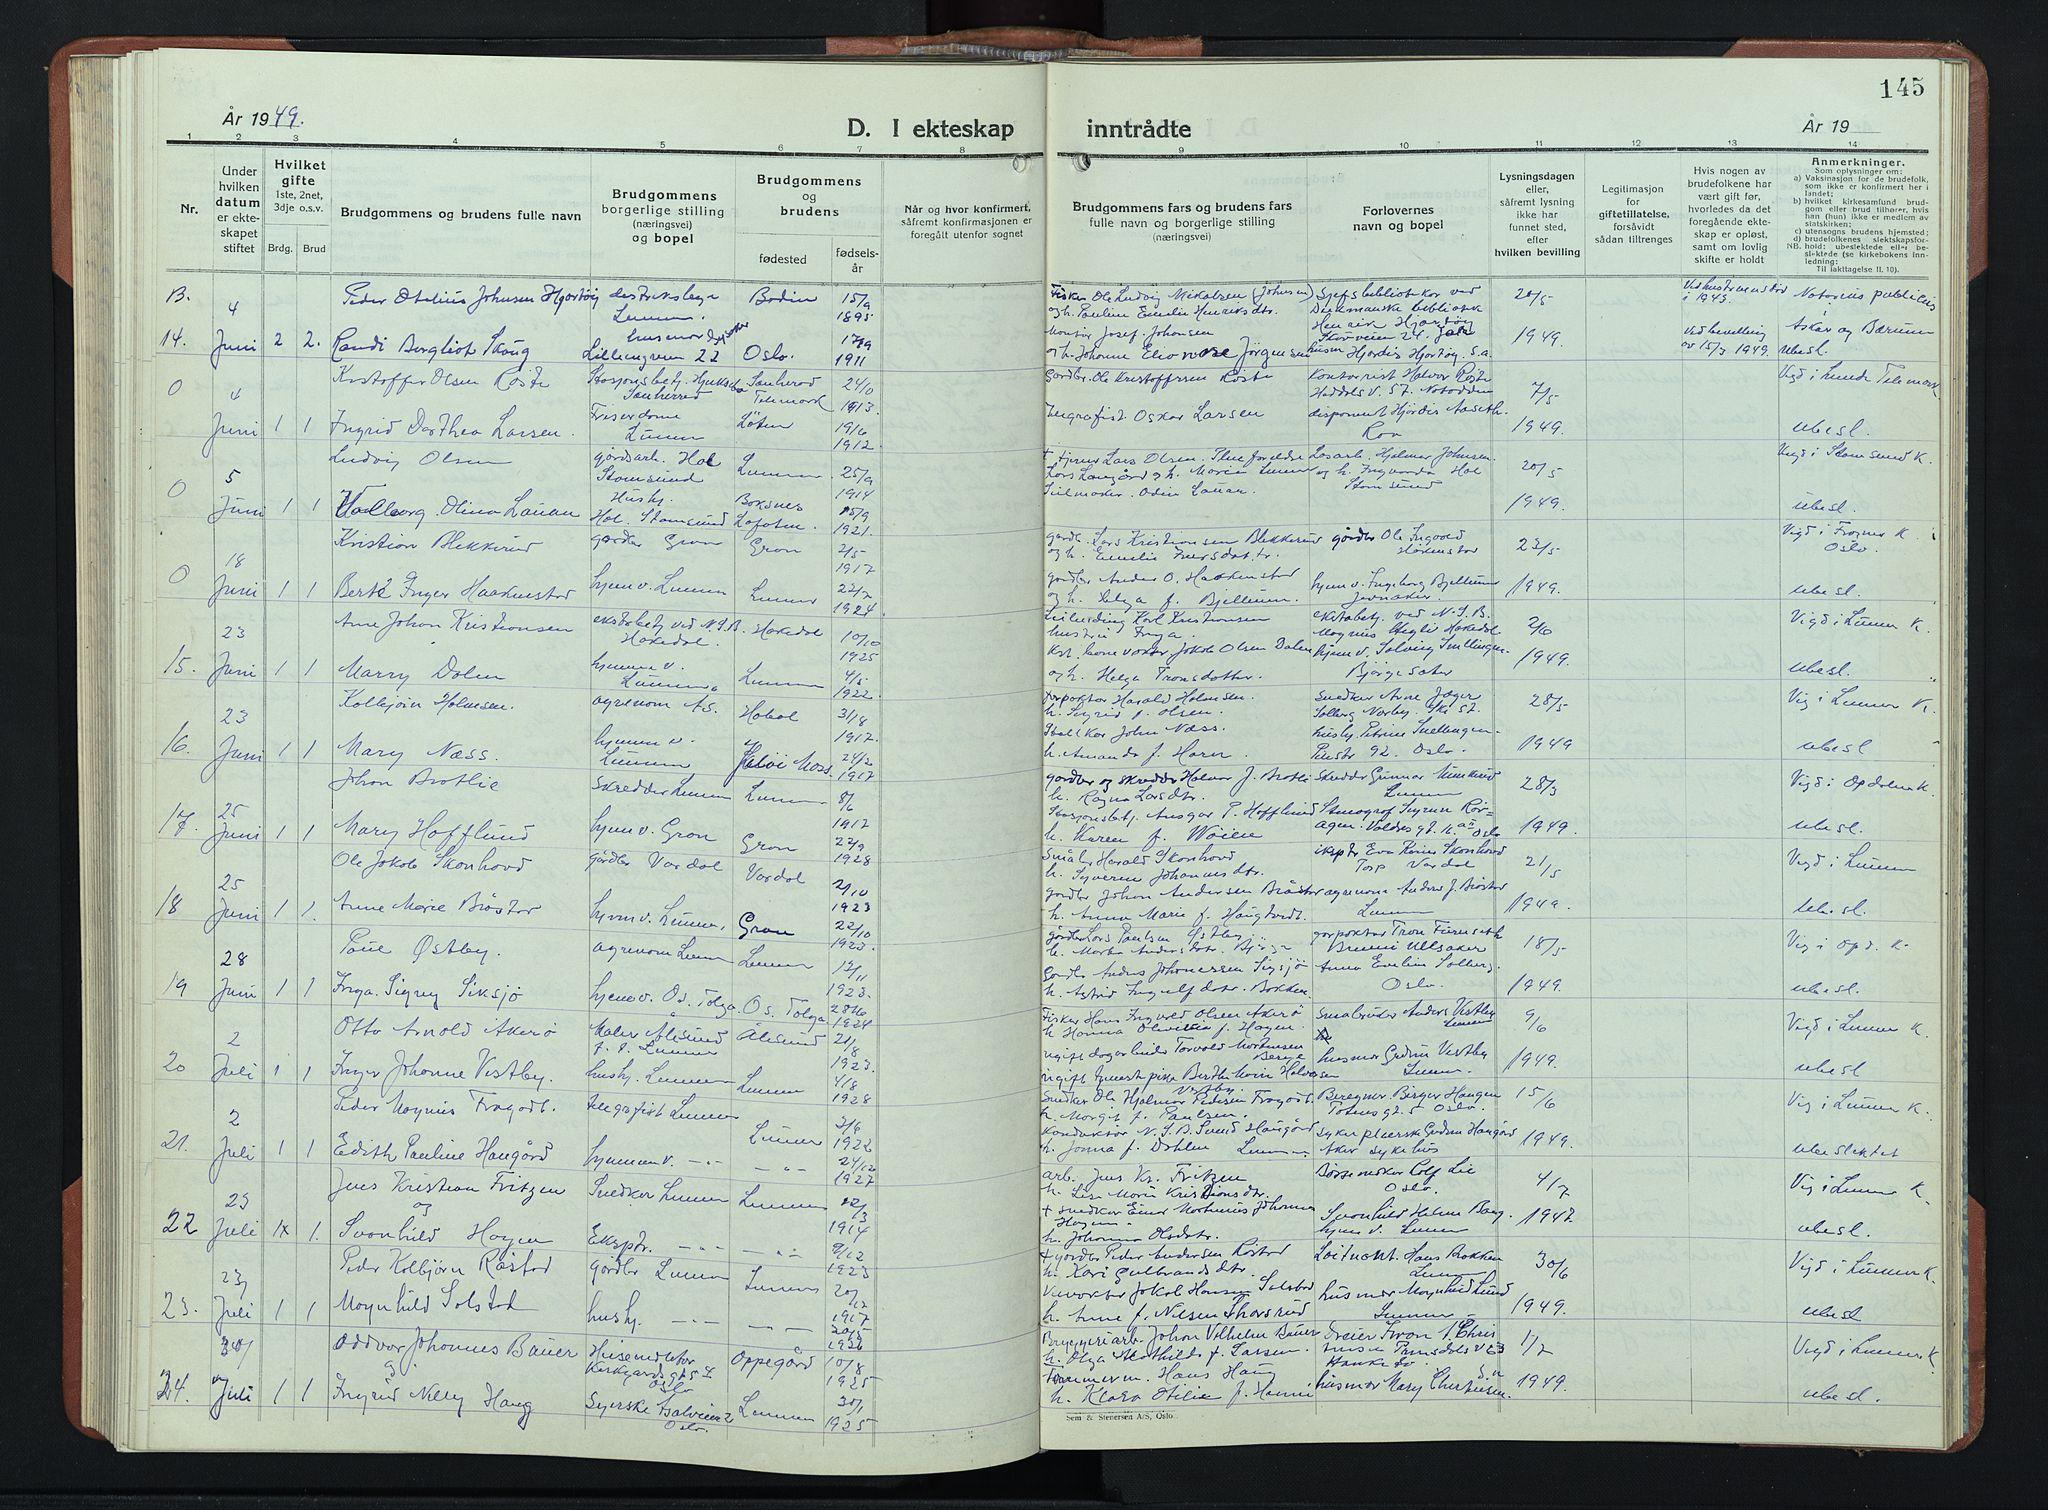 SAH, Lunner prestekontor, H/Ha/Hab/L0004: Klokkerbok nr. 4, 1943-1952, s. 145